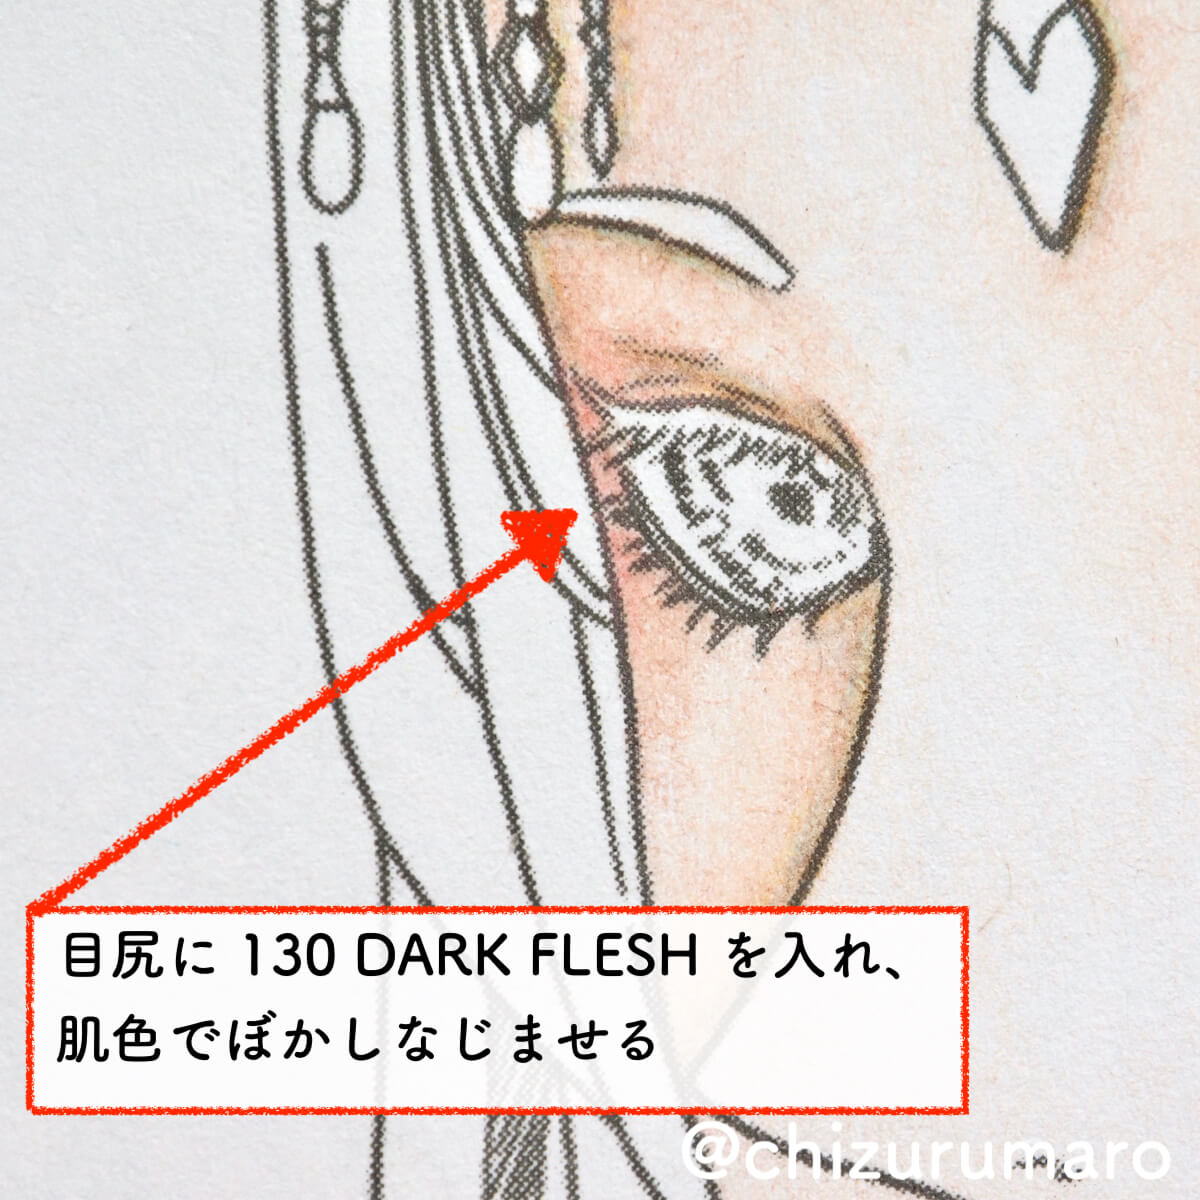 f:id:chizurumaro:20200426134123j:plain